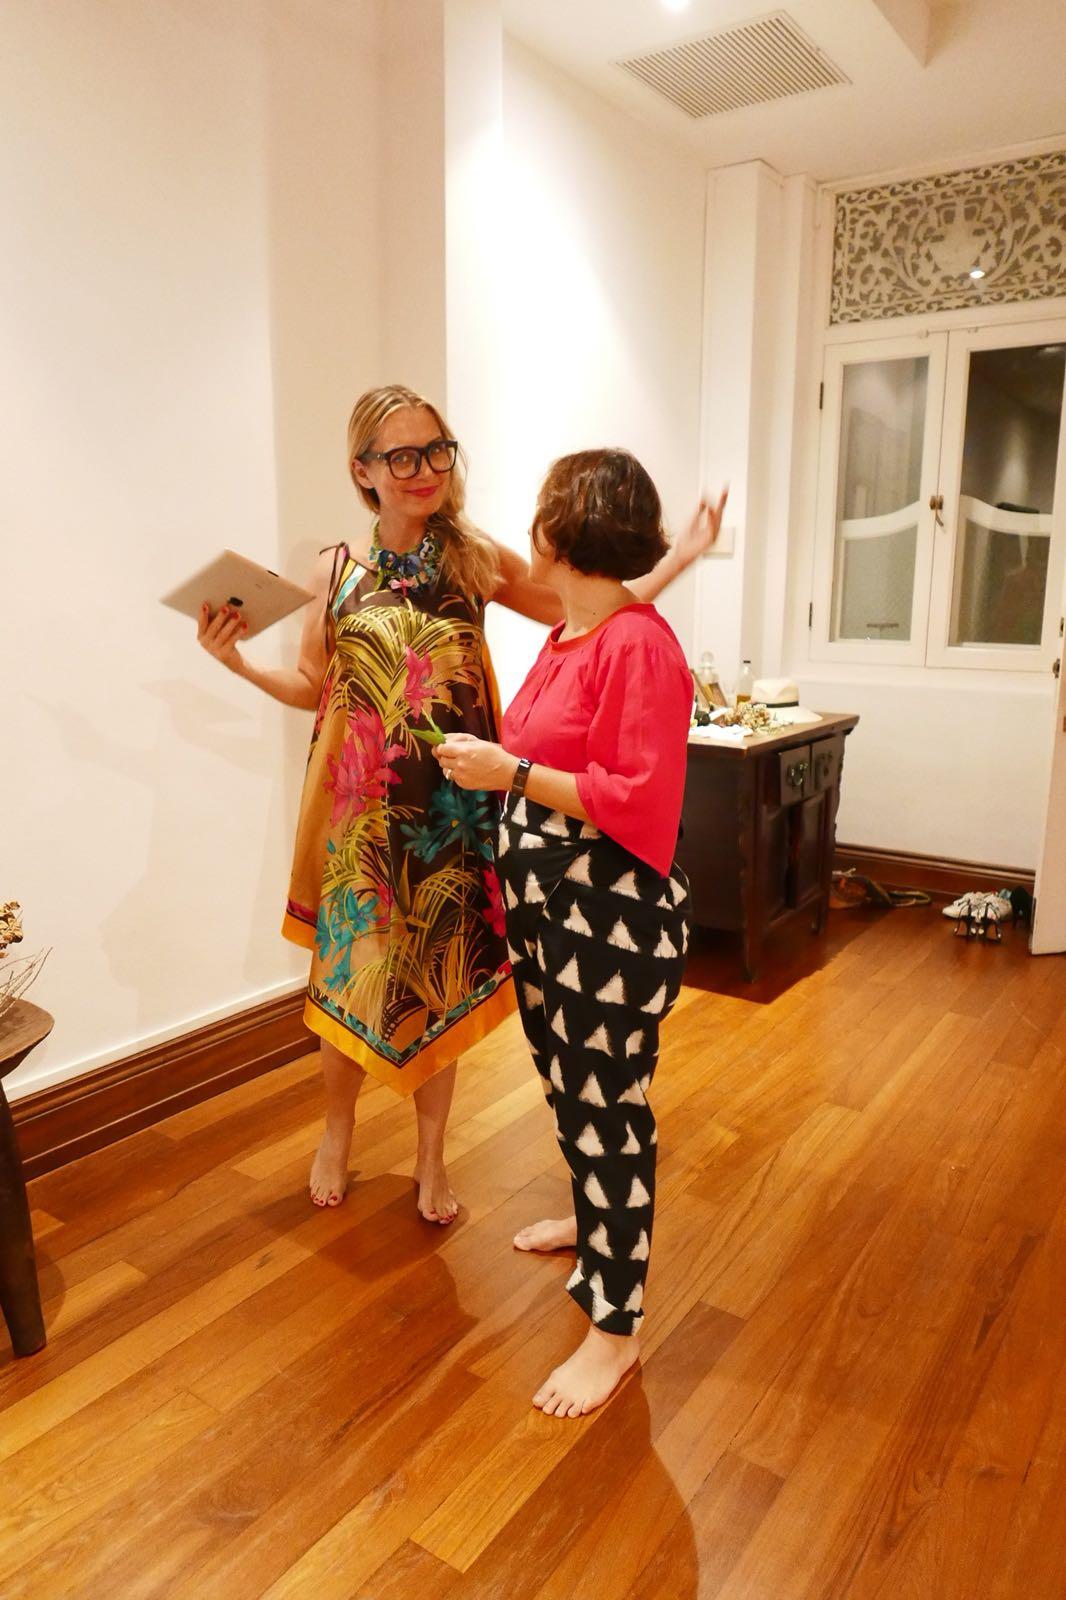 Mamakan and Elaine Friedlander sharing notes and ideas.